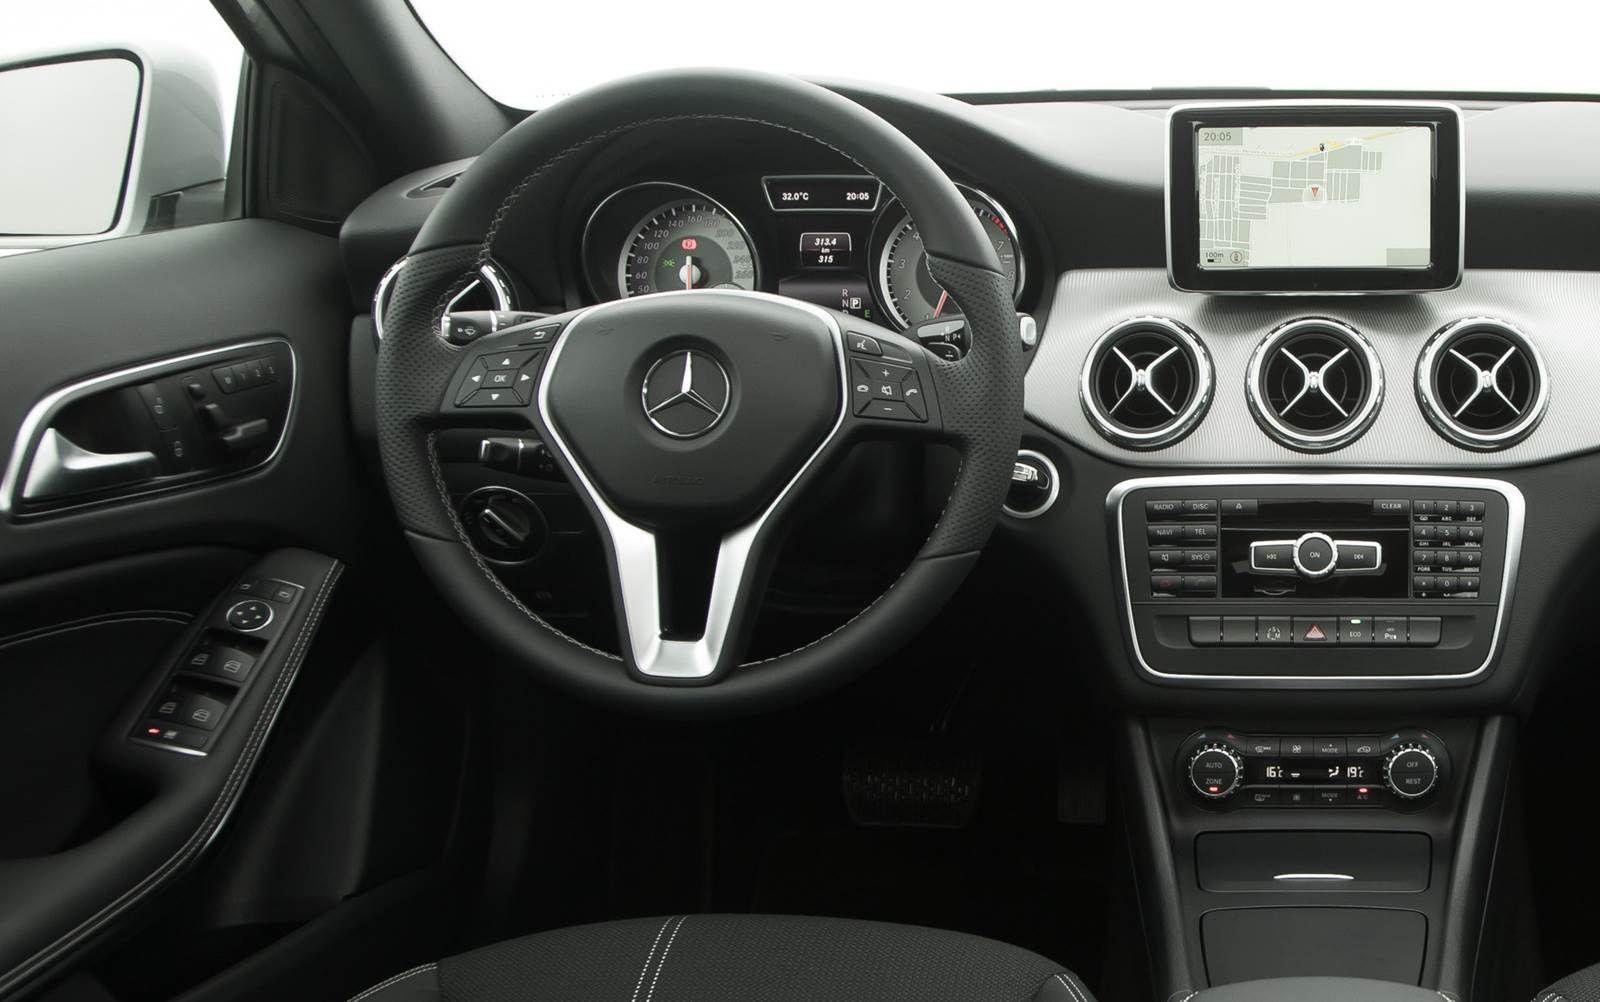 Mercedes Benz Gla 200 Advance Interior | Mondean